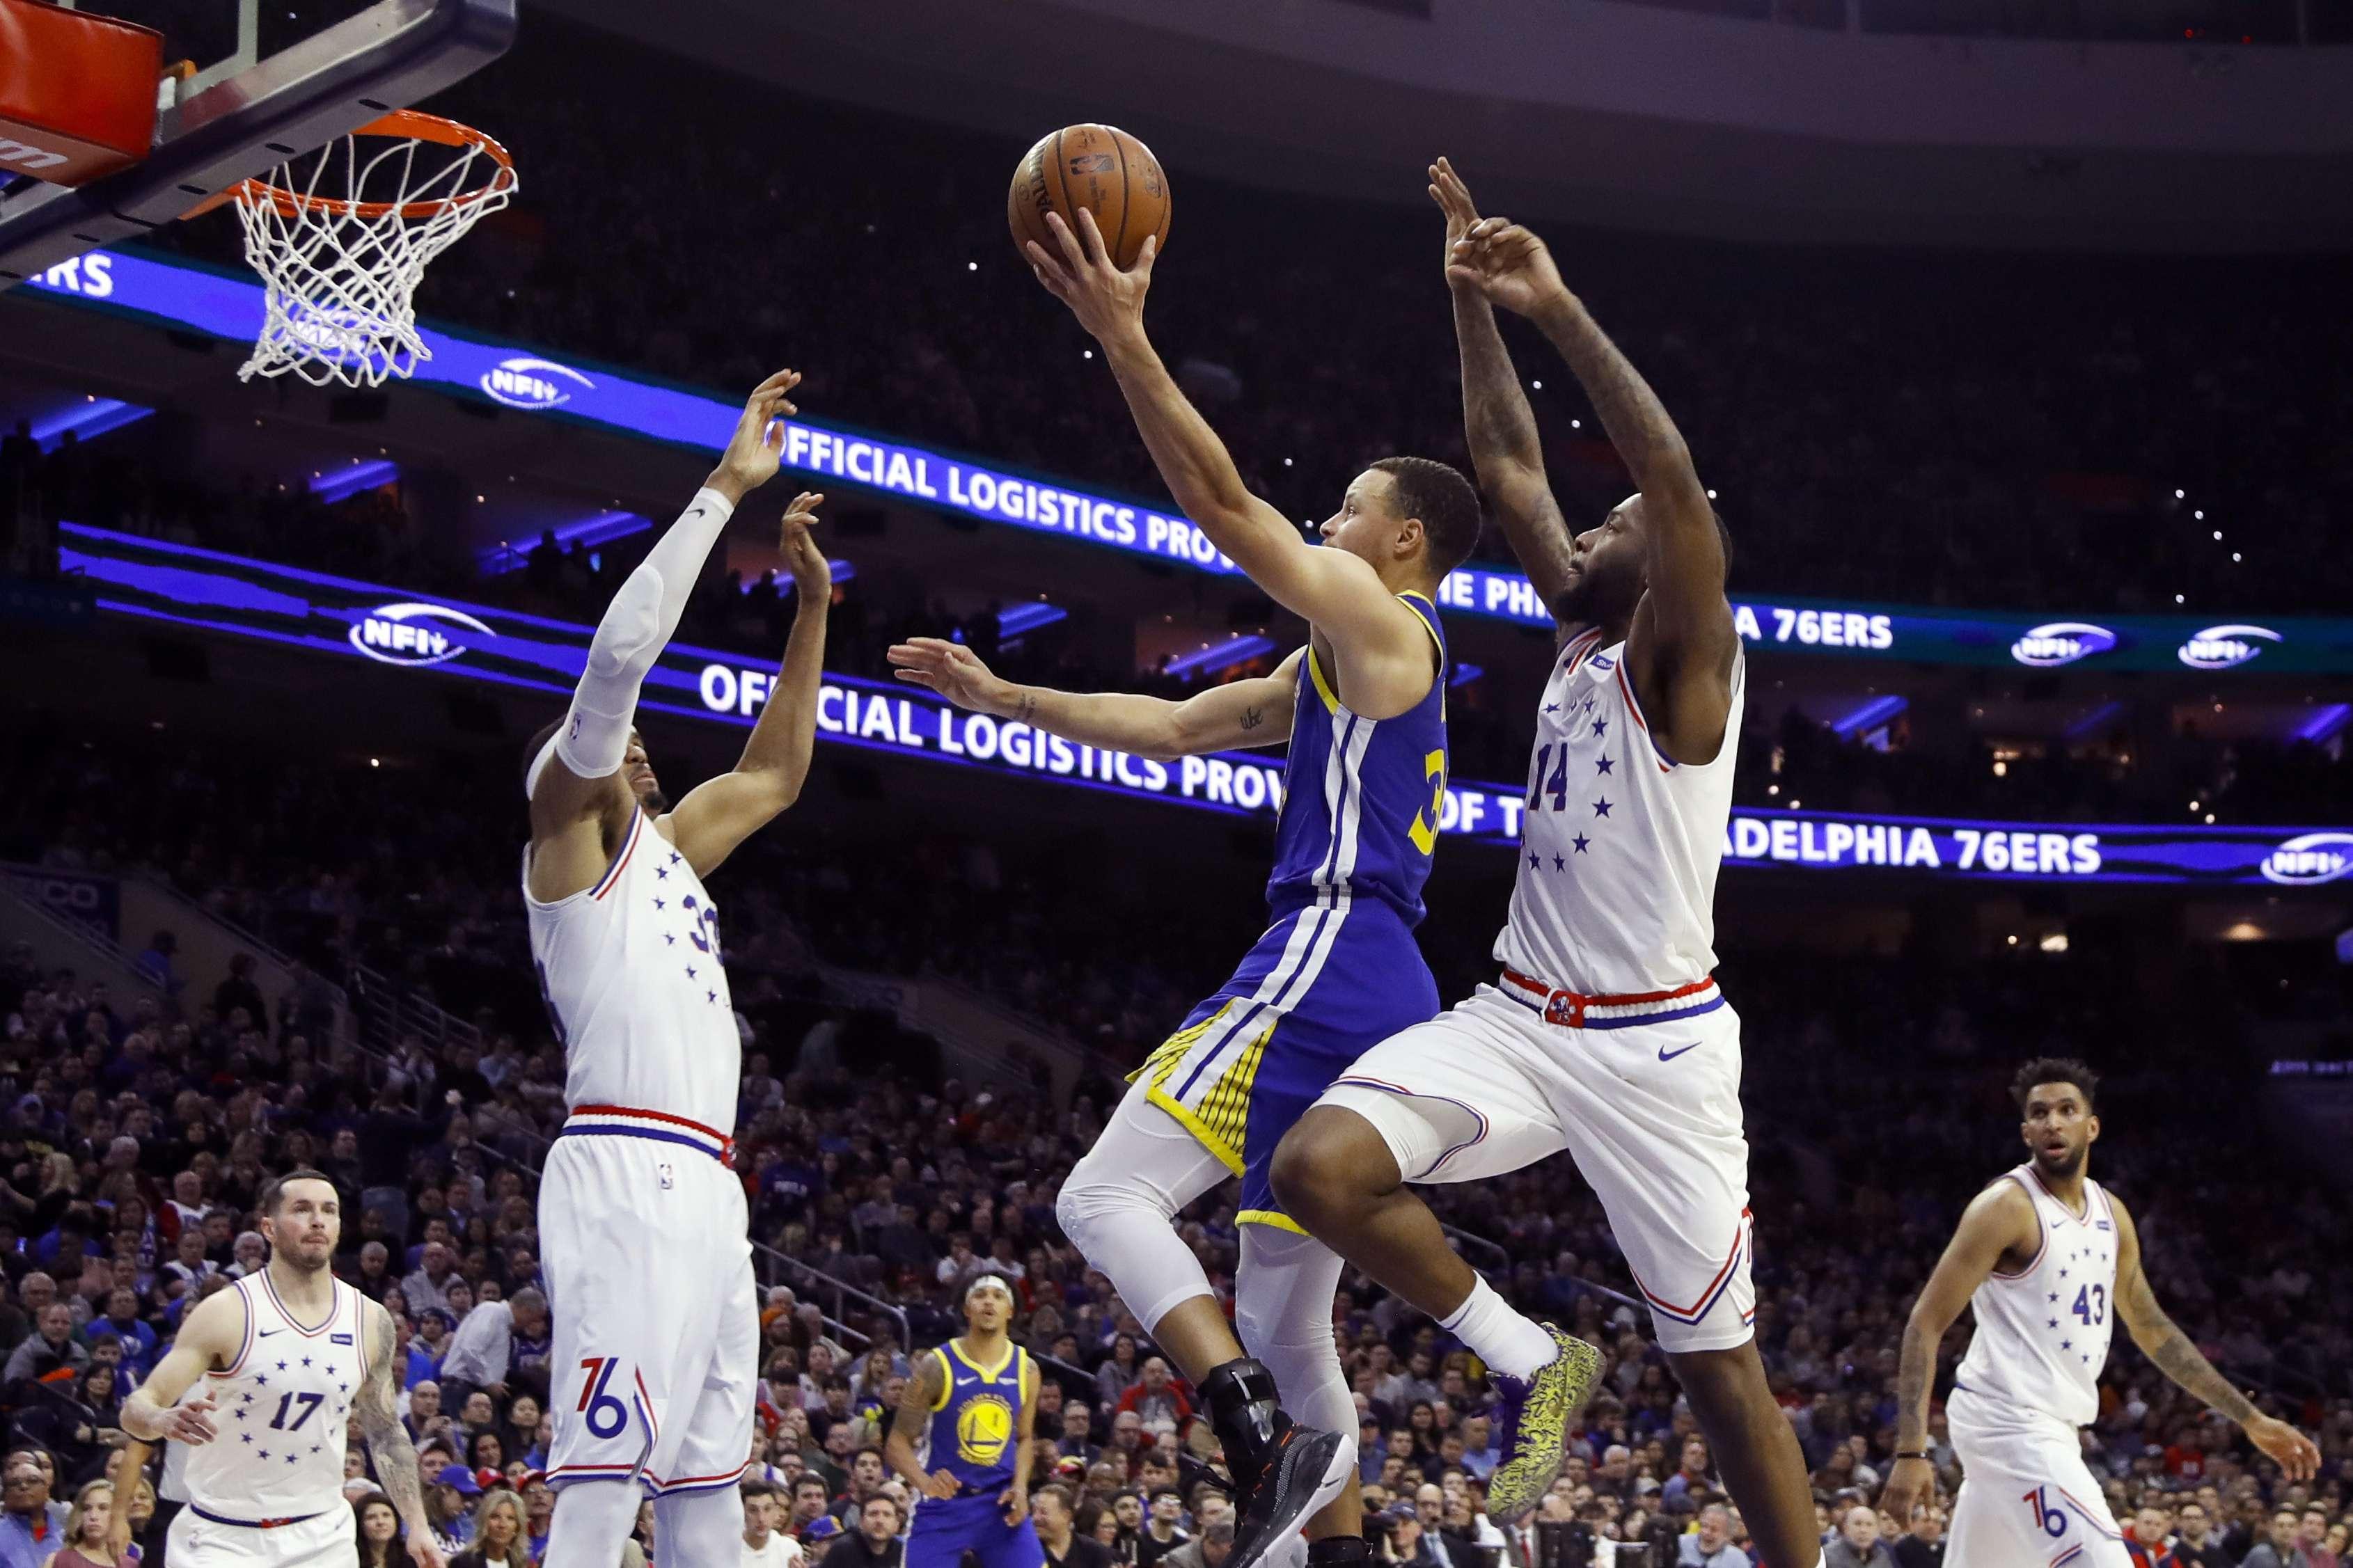 Curry anota 28 puntos y Warriors ganan 120-117 a 76ers 07aa1a14cea